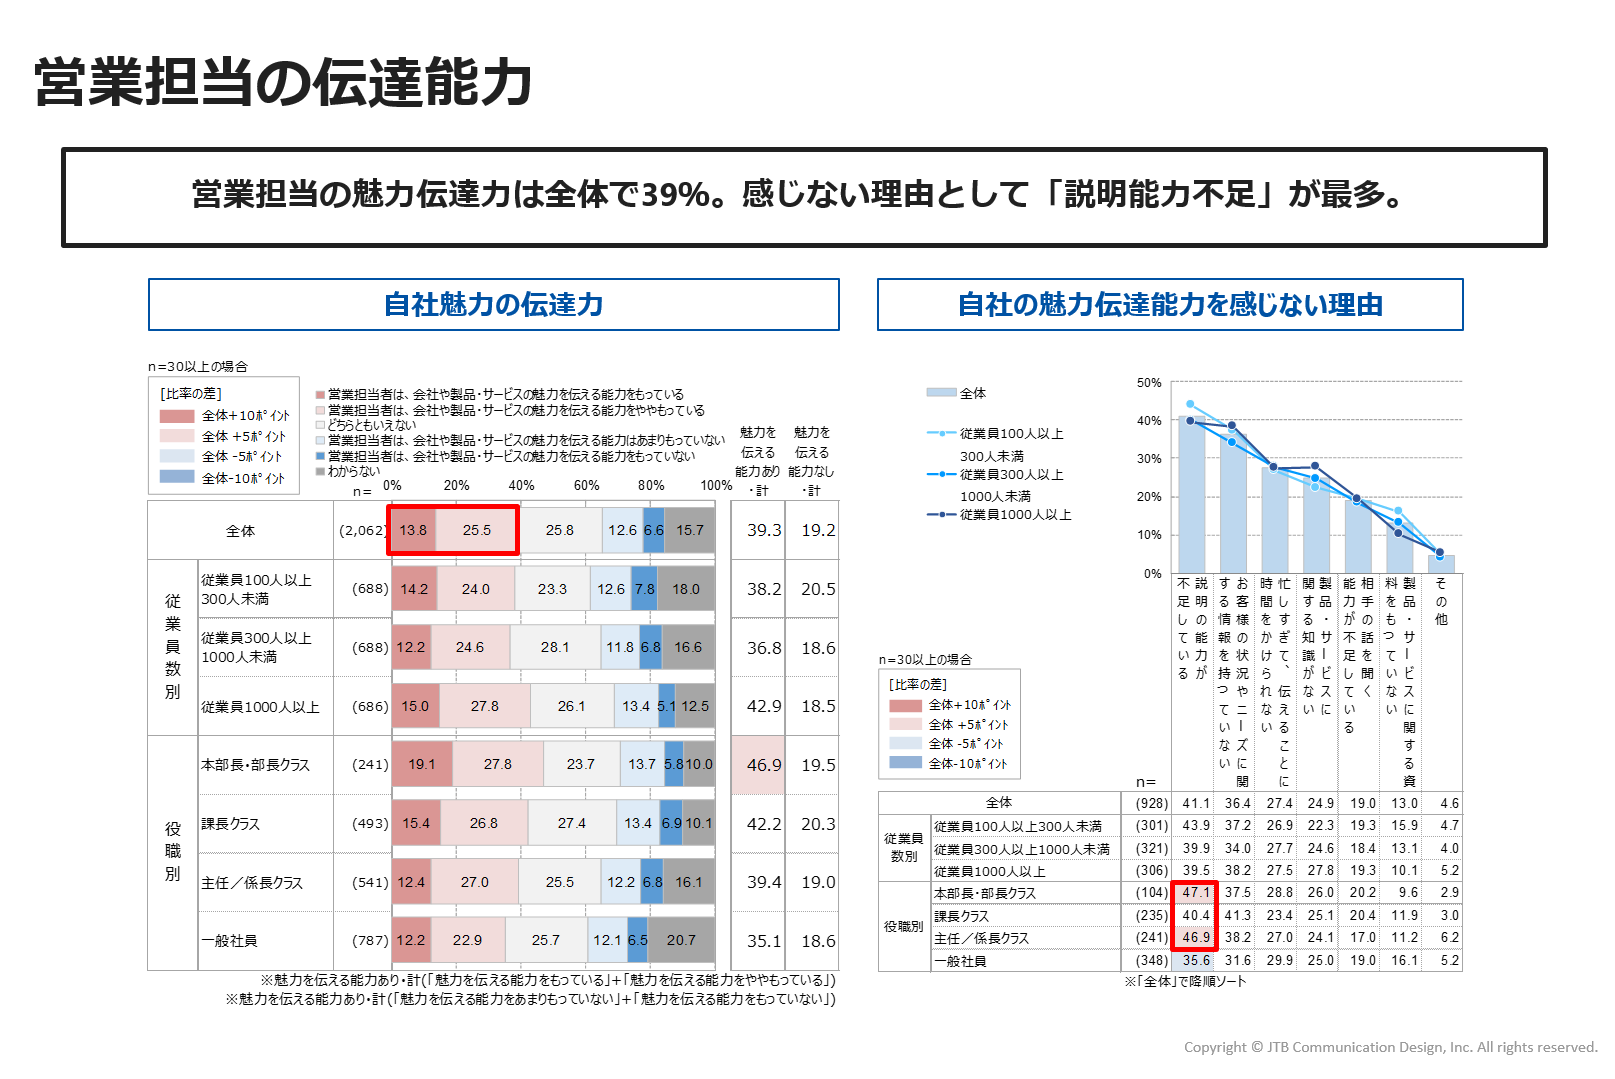 https://www.jtbcom.co.jp/article/img/commu-figure6.png